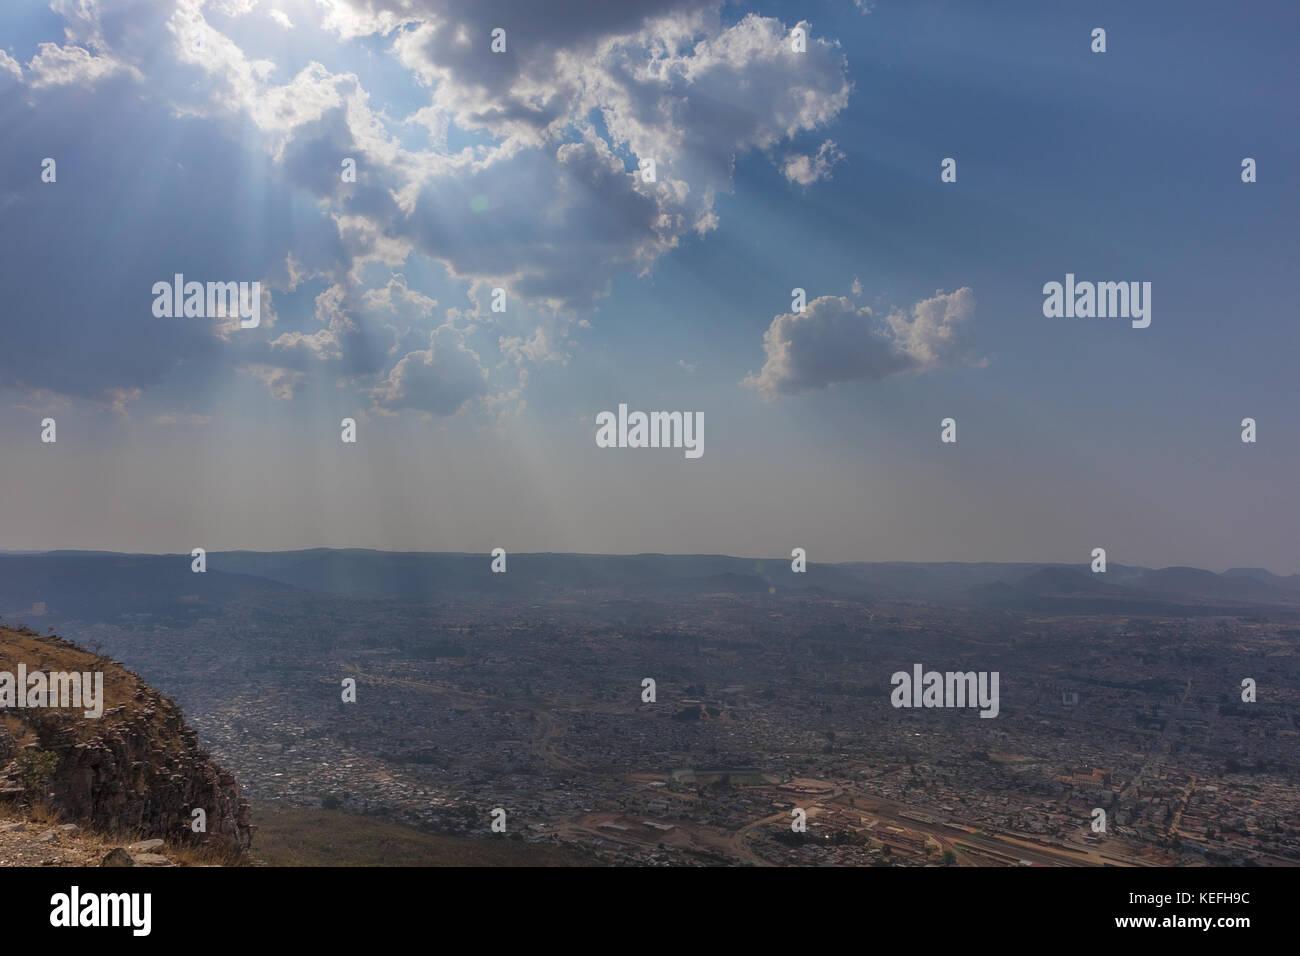 View to the city of Lubango. Angola. - Stock Image